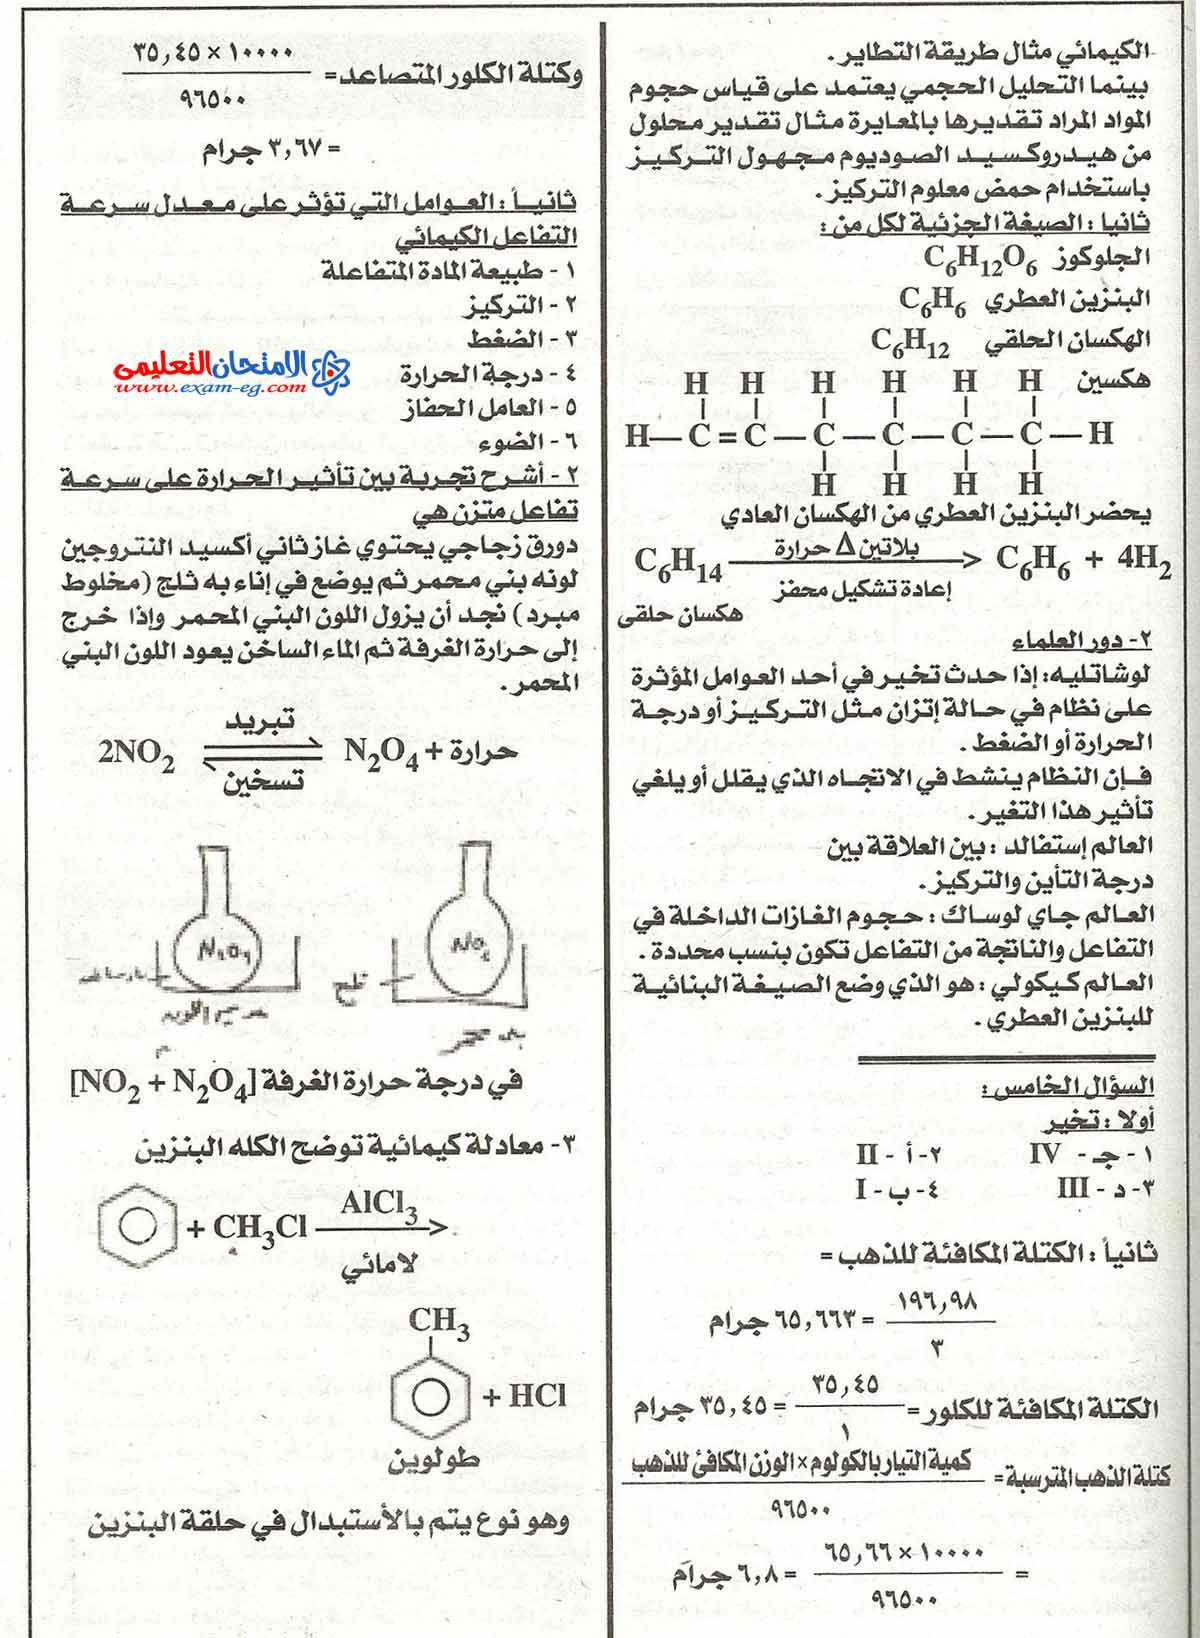 exam-eg.com_1429843030225.jpg